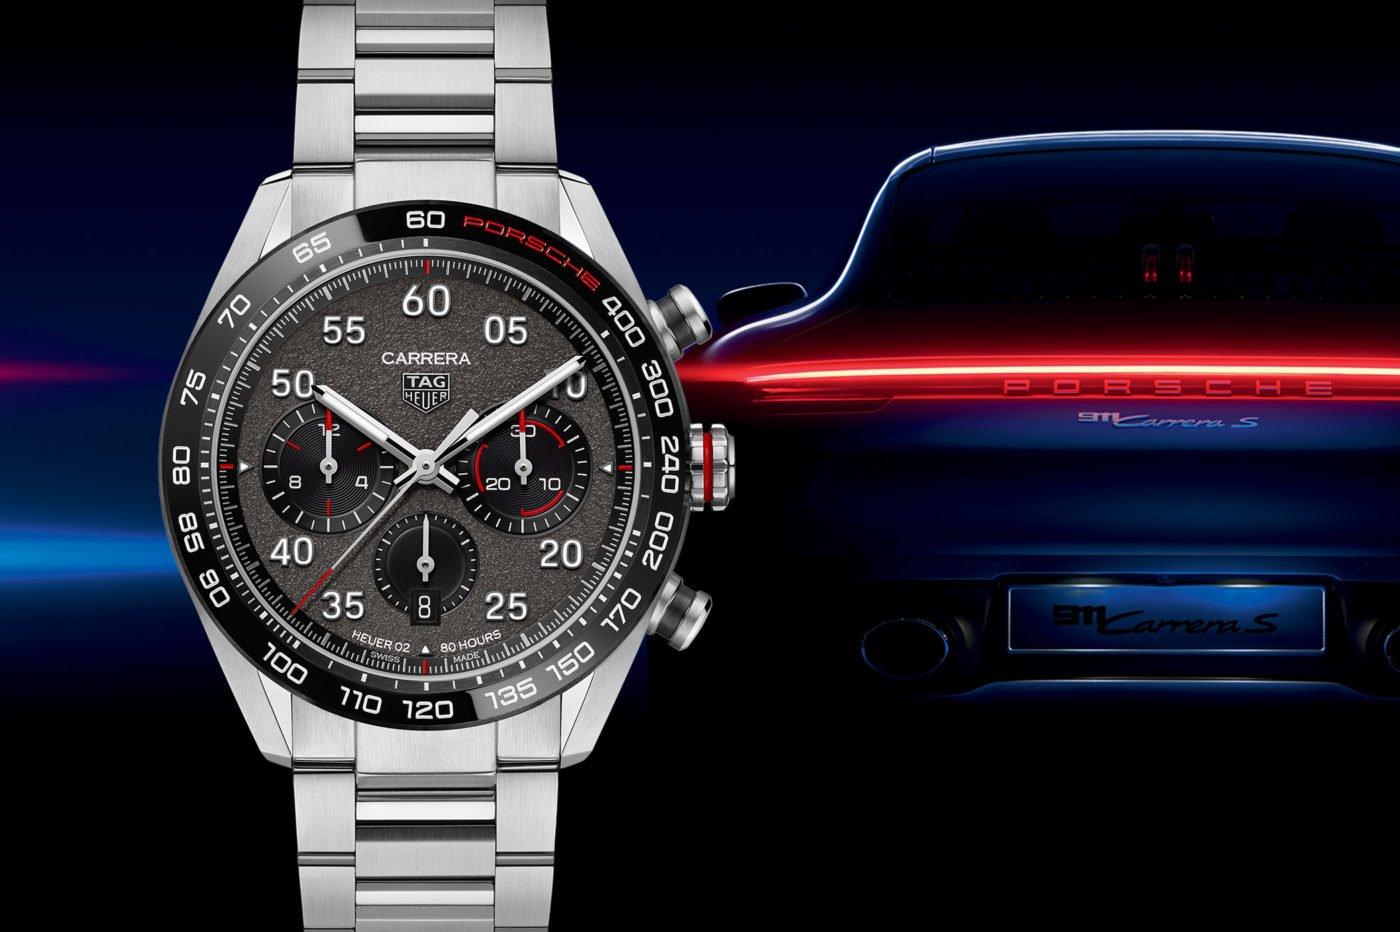 TAG Heuer Carrera Porsche Chronograph Special Edition 44 mm Heuer 02 Automatic [dostępność, cena]